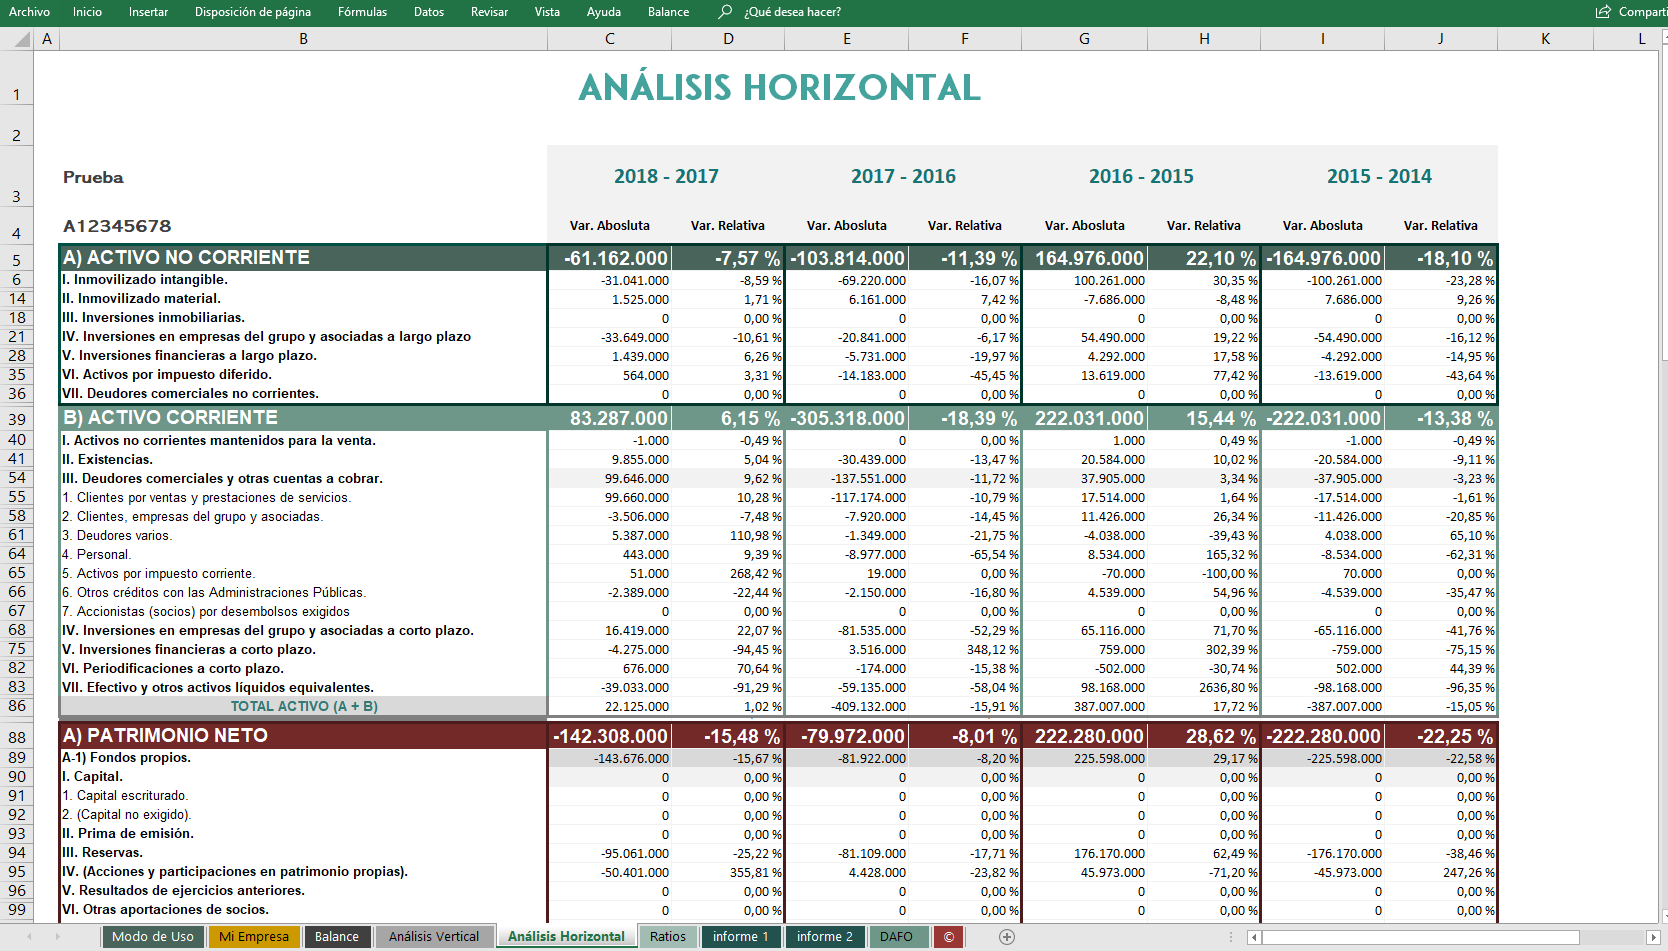 Ejemplo de análisis horizontal